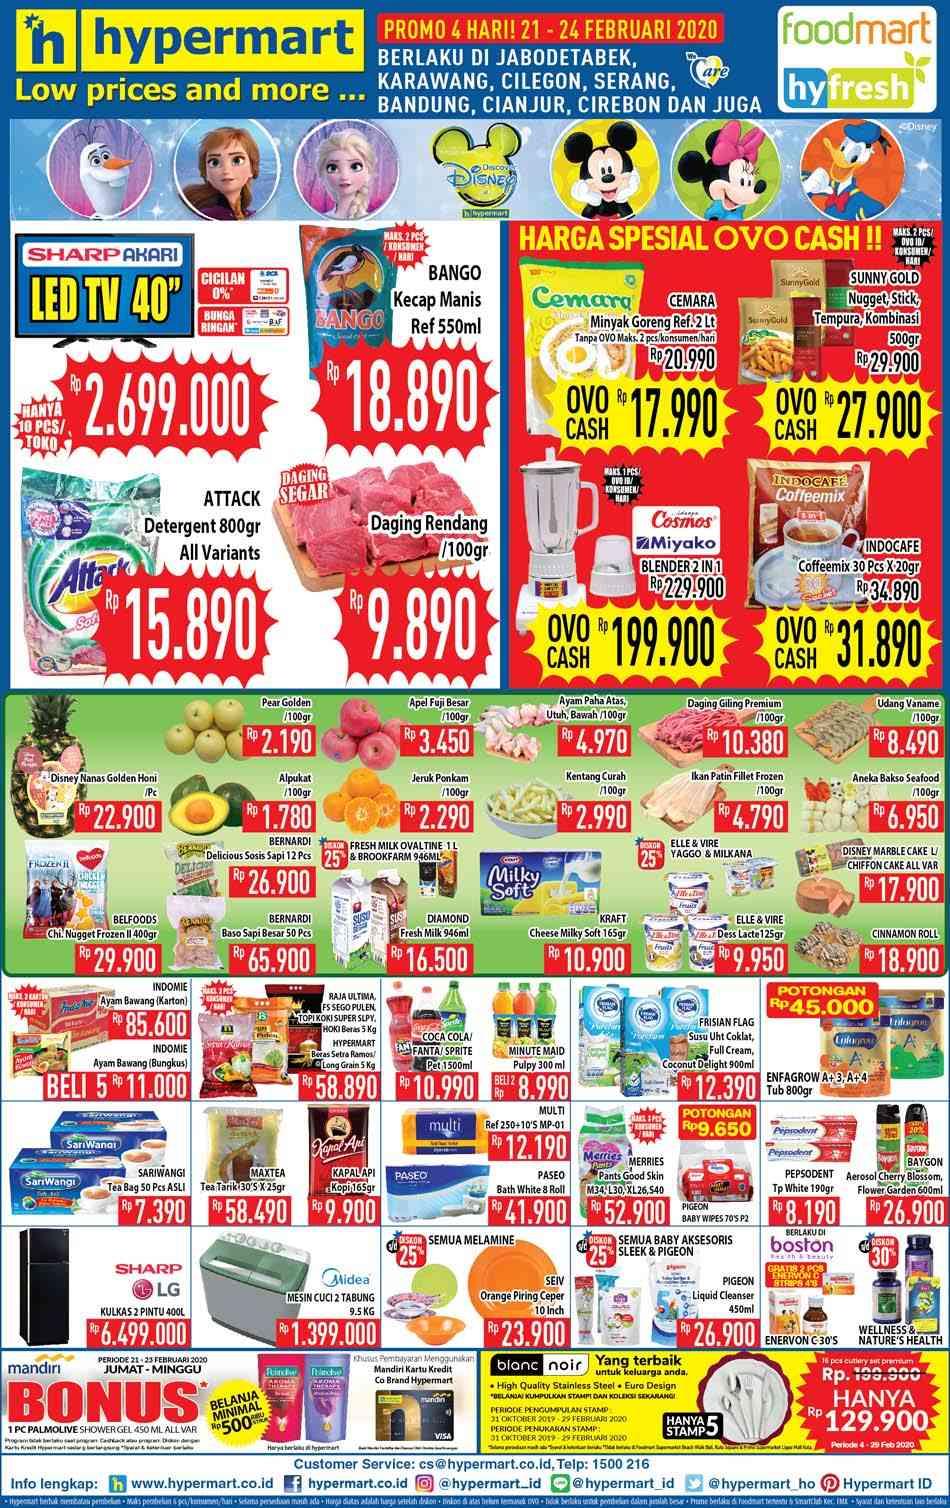 Hypermart Promo Katalog Periode 21-24 Februari 2020